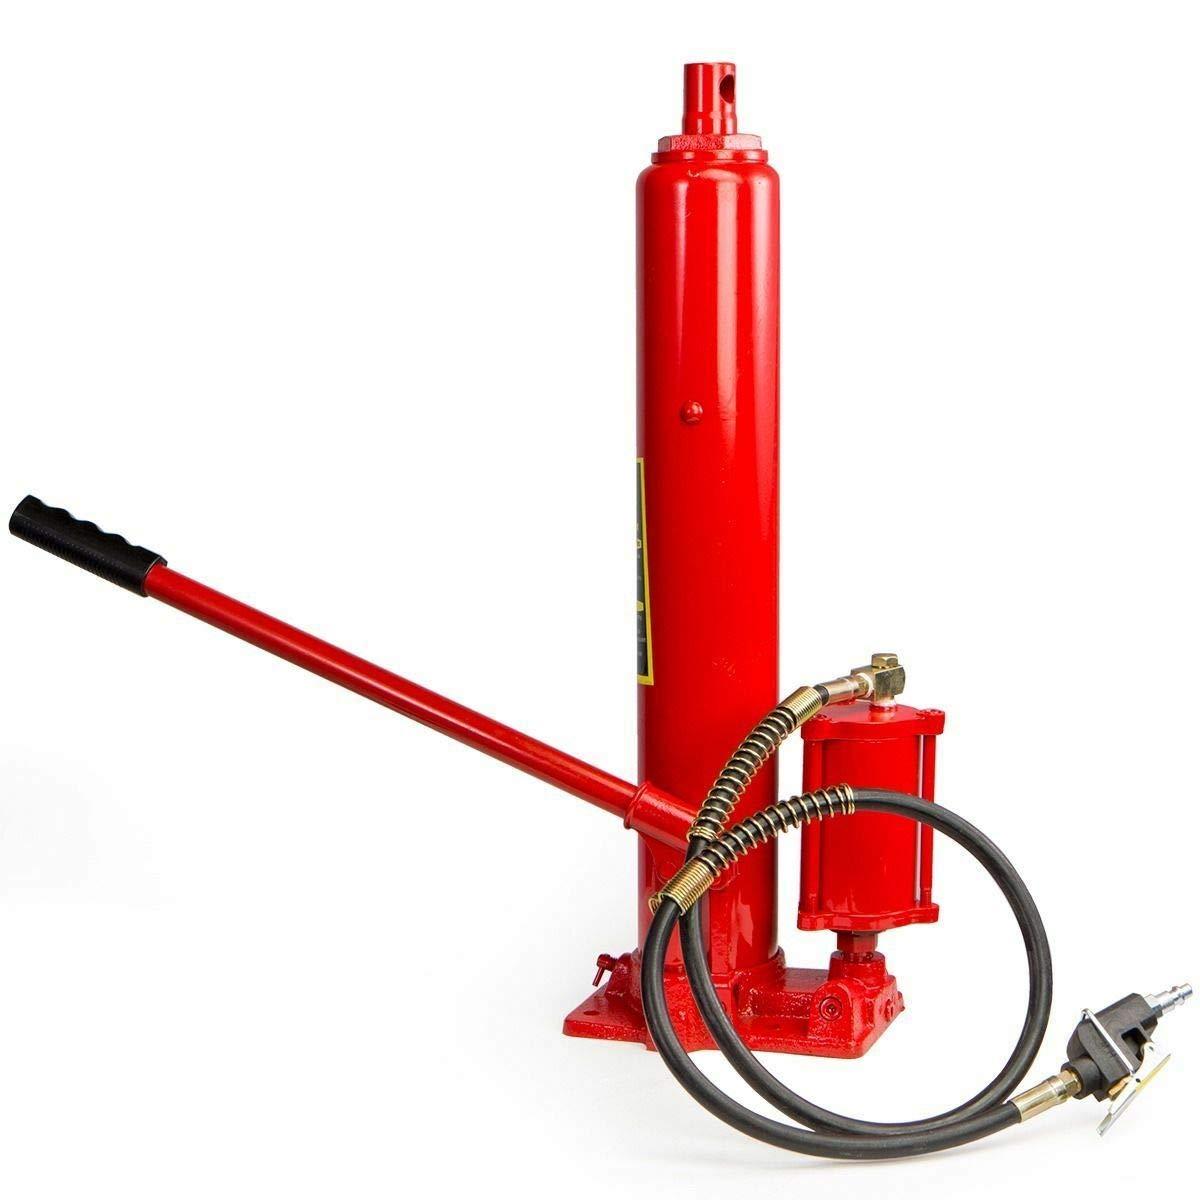 9TRADING 2 in1 8 ton air Manual Hydraulic Ram Jack Pump Engine Lift Hoist Cherry Picker by 9TRADING